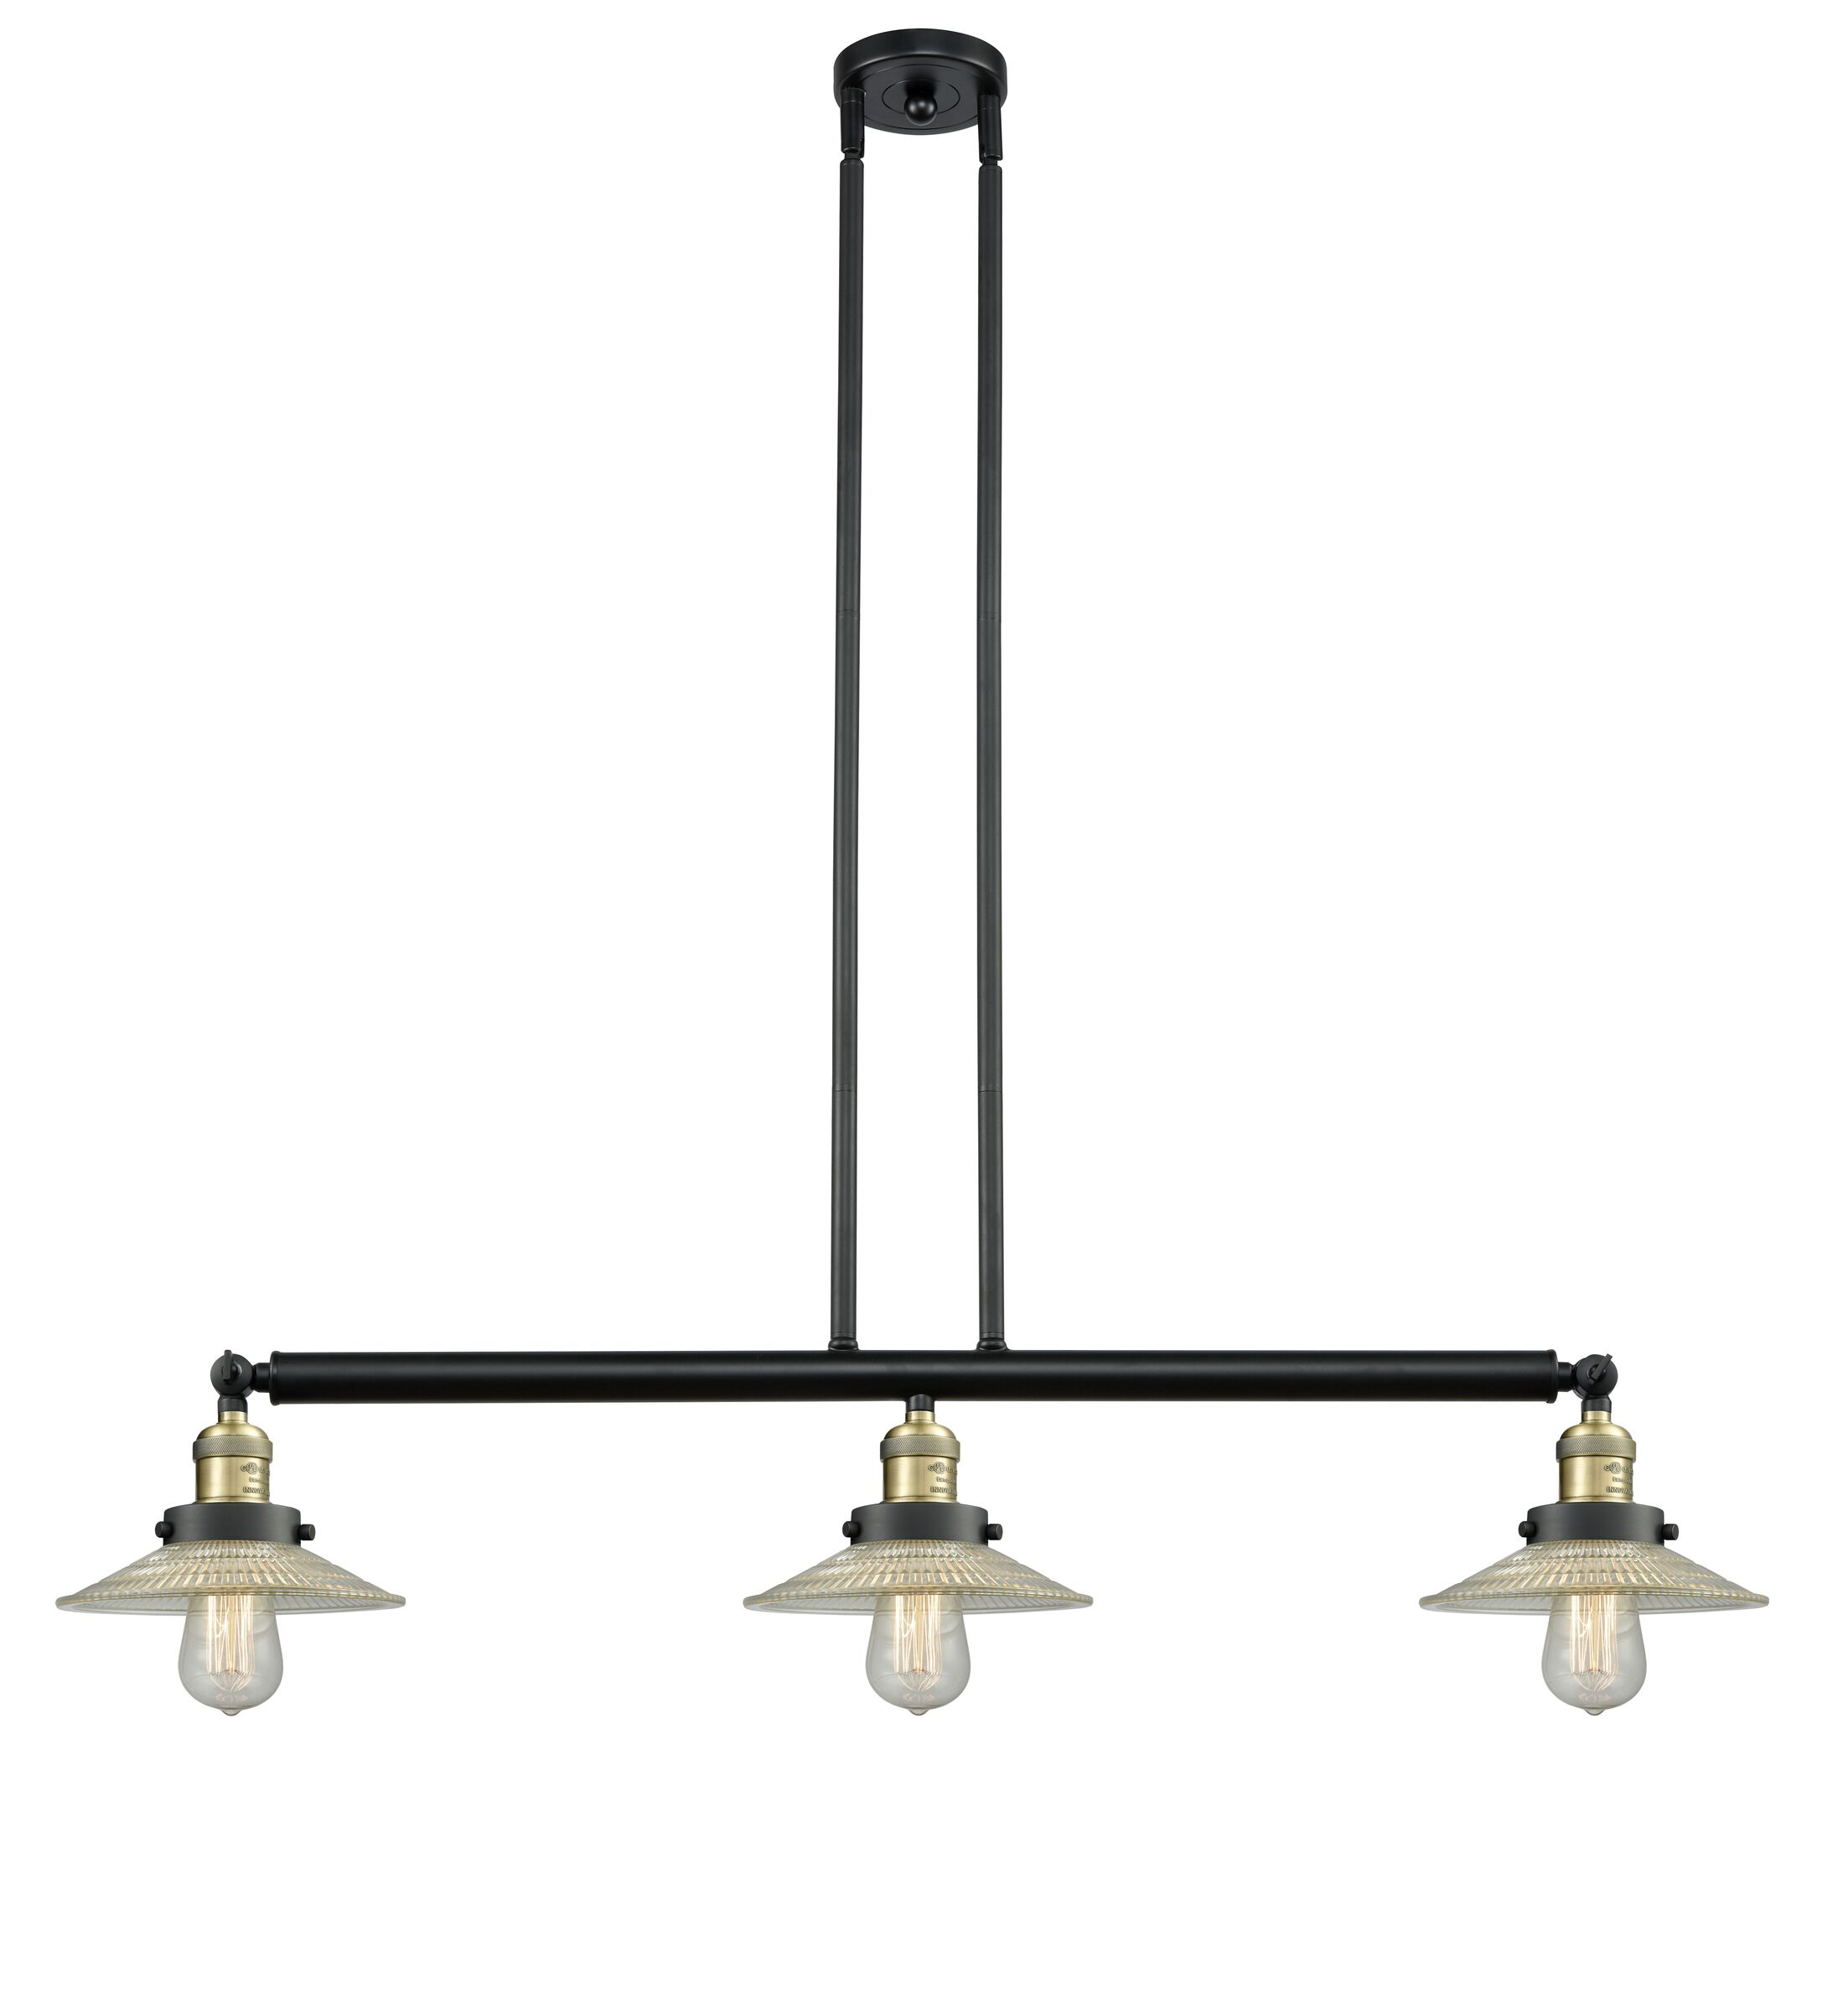 Briar 3-Light Kitchen Island Pendant Bulb Type: LED, Finish: Black Antique Brass